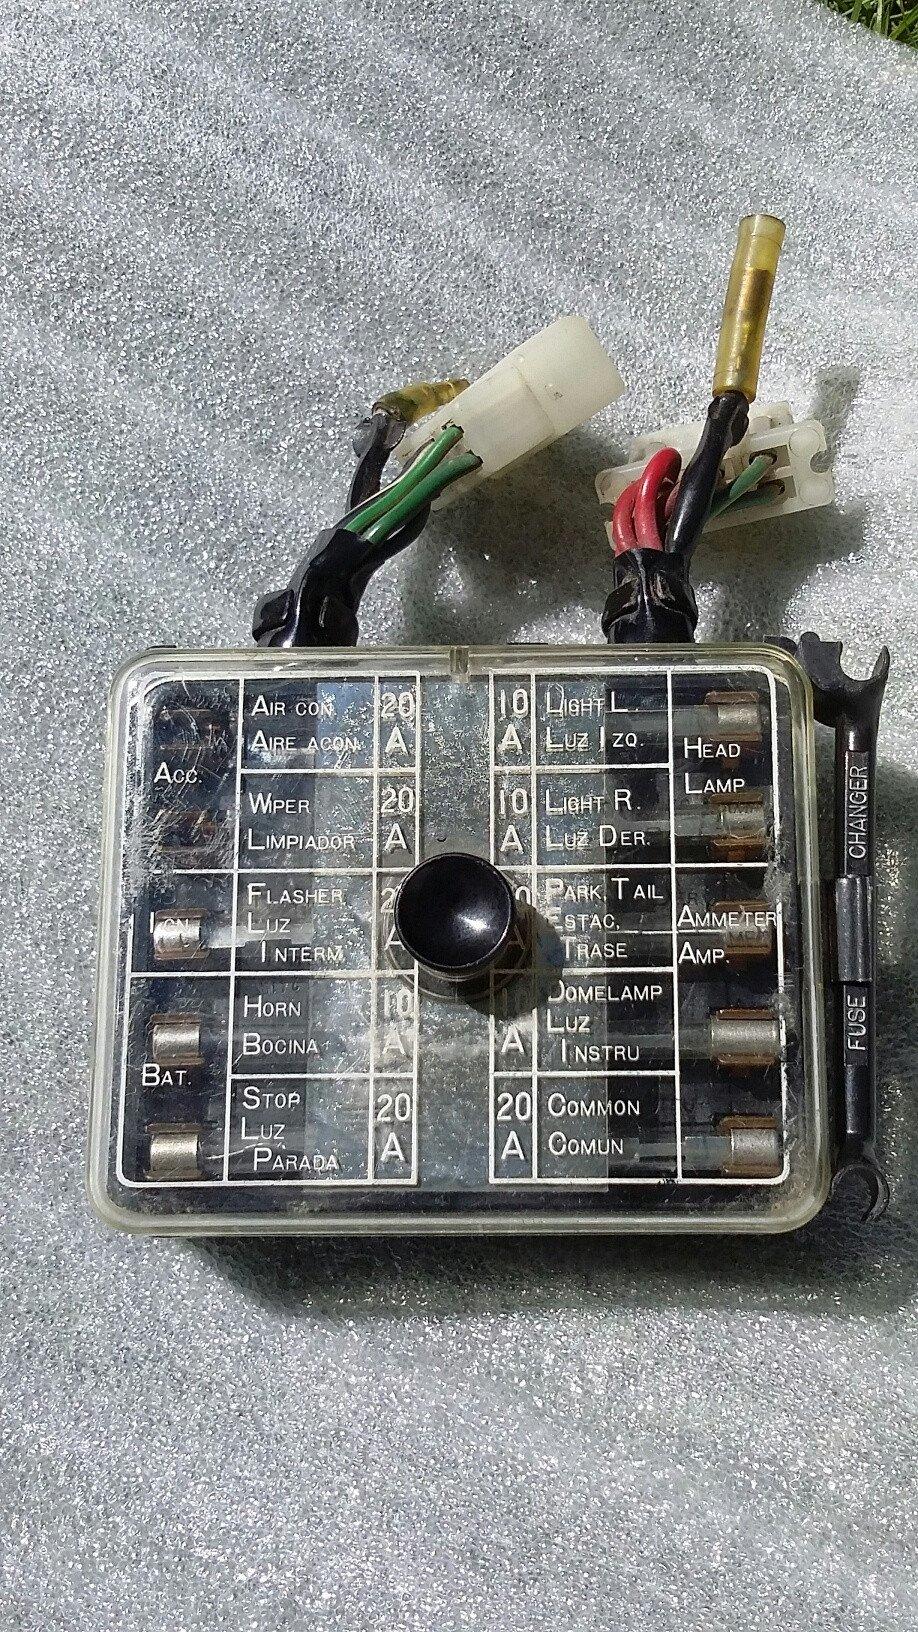 1977 280z Fuse Box Flame Sensor Wiring Diagram Dodyjm Sampwire Jeanjaures37 Fr